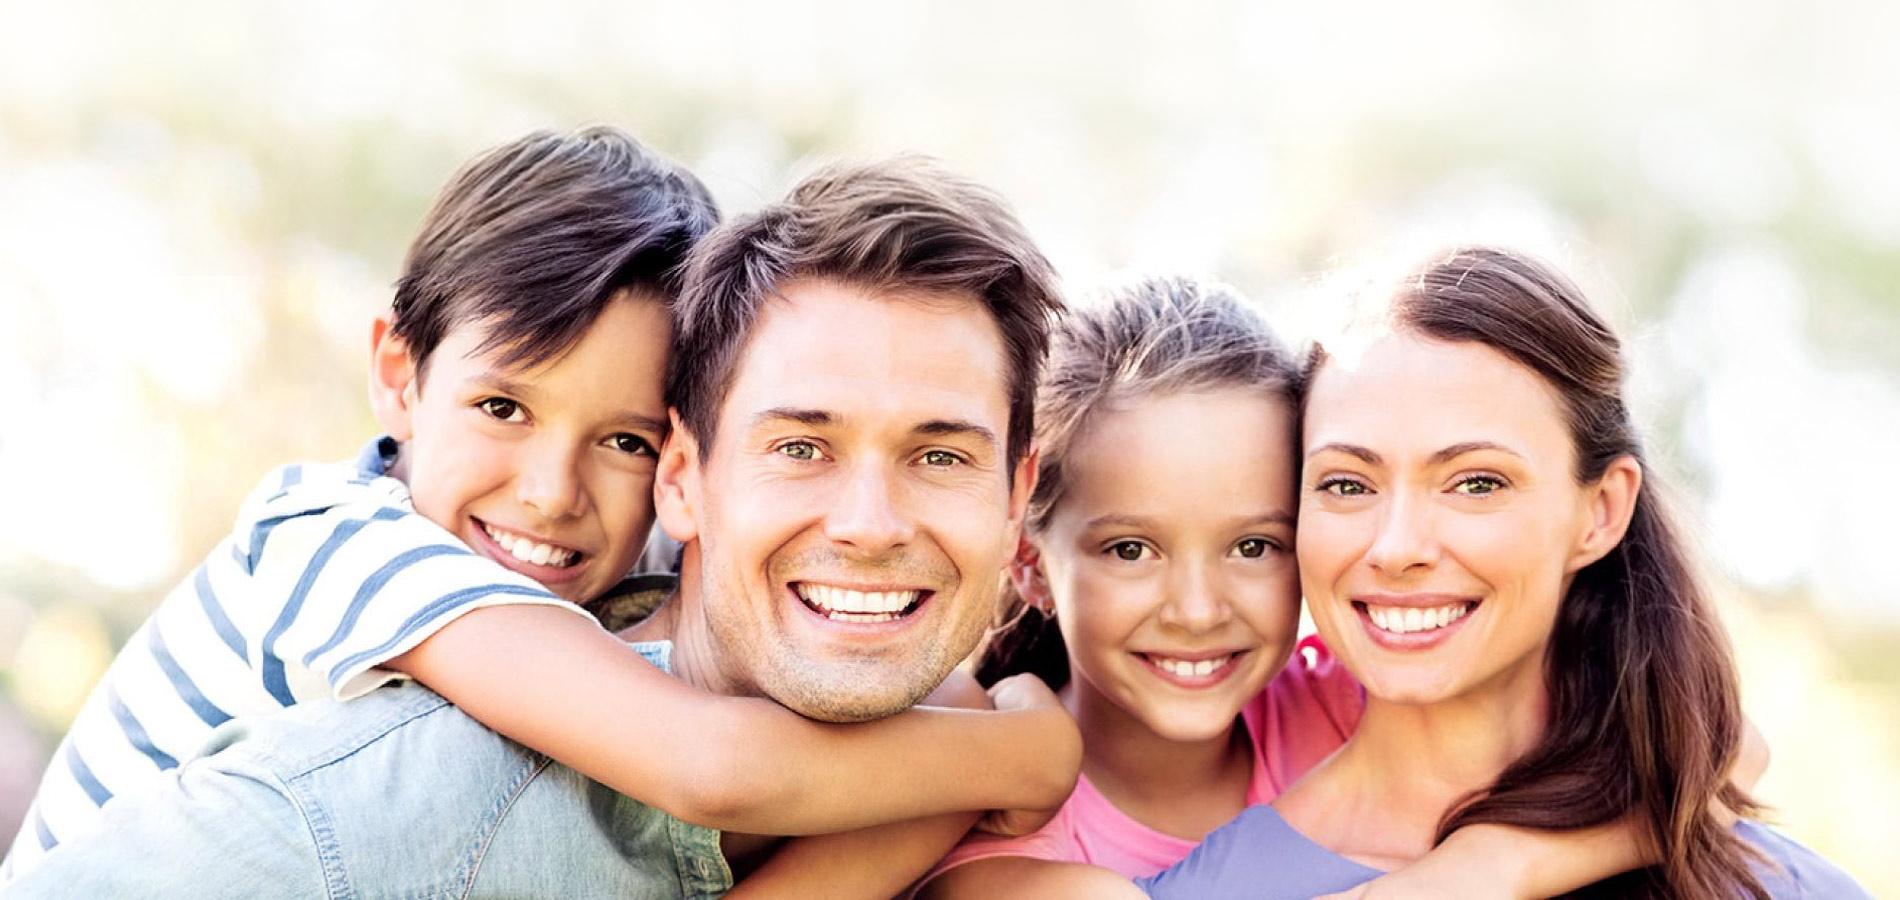 yetişkinlerde ortodontist